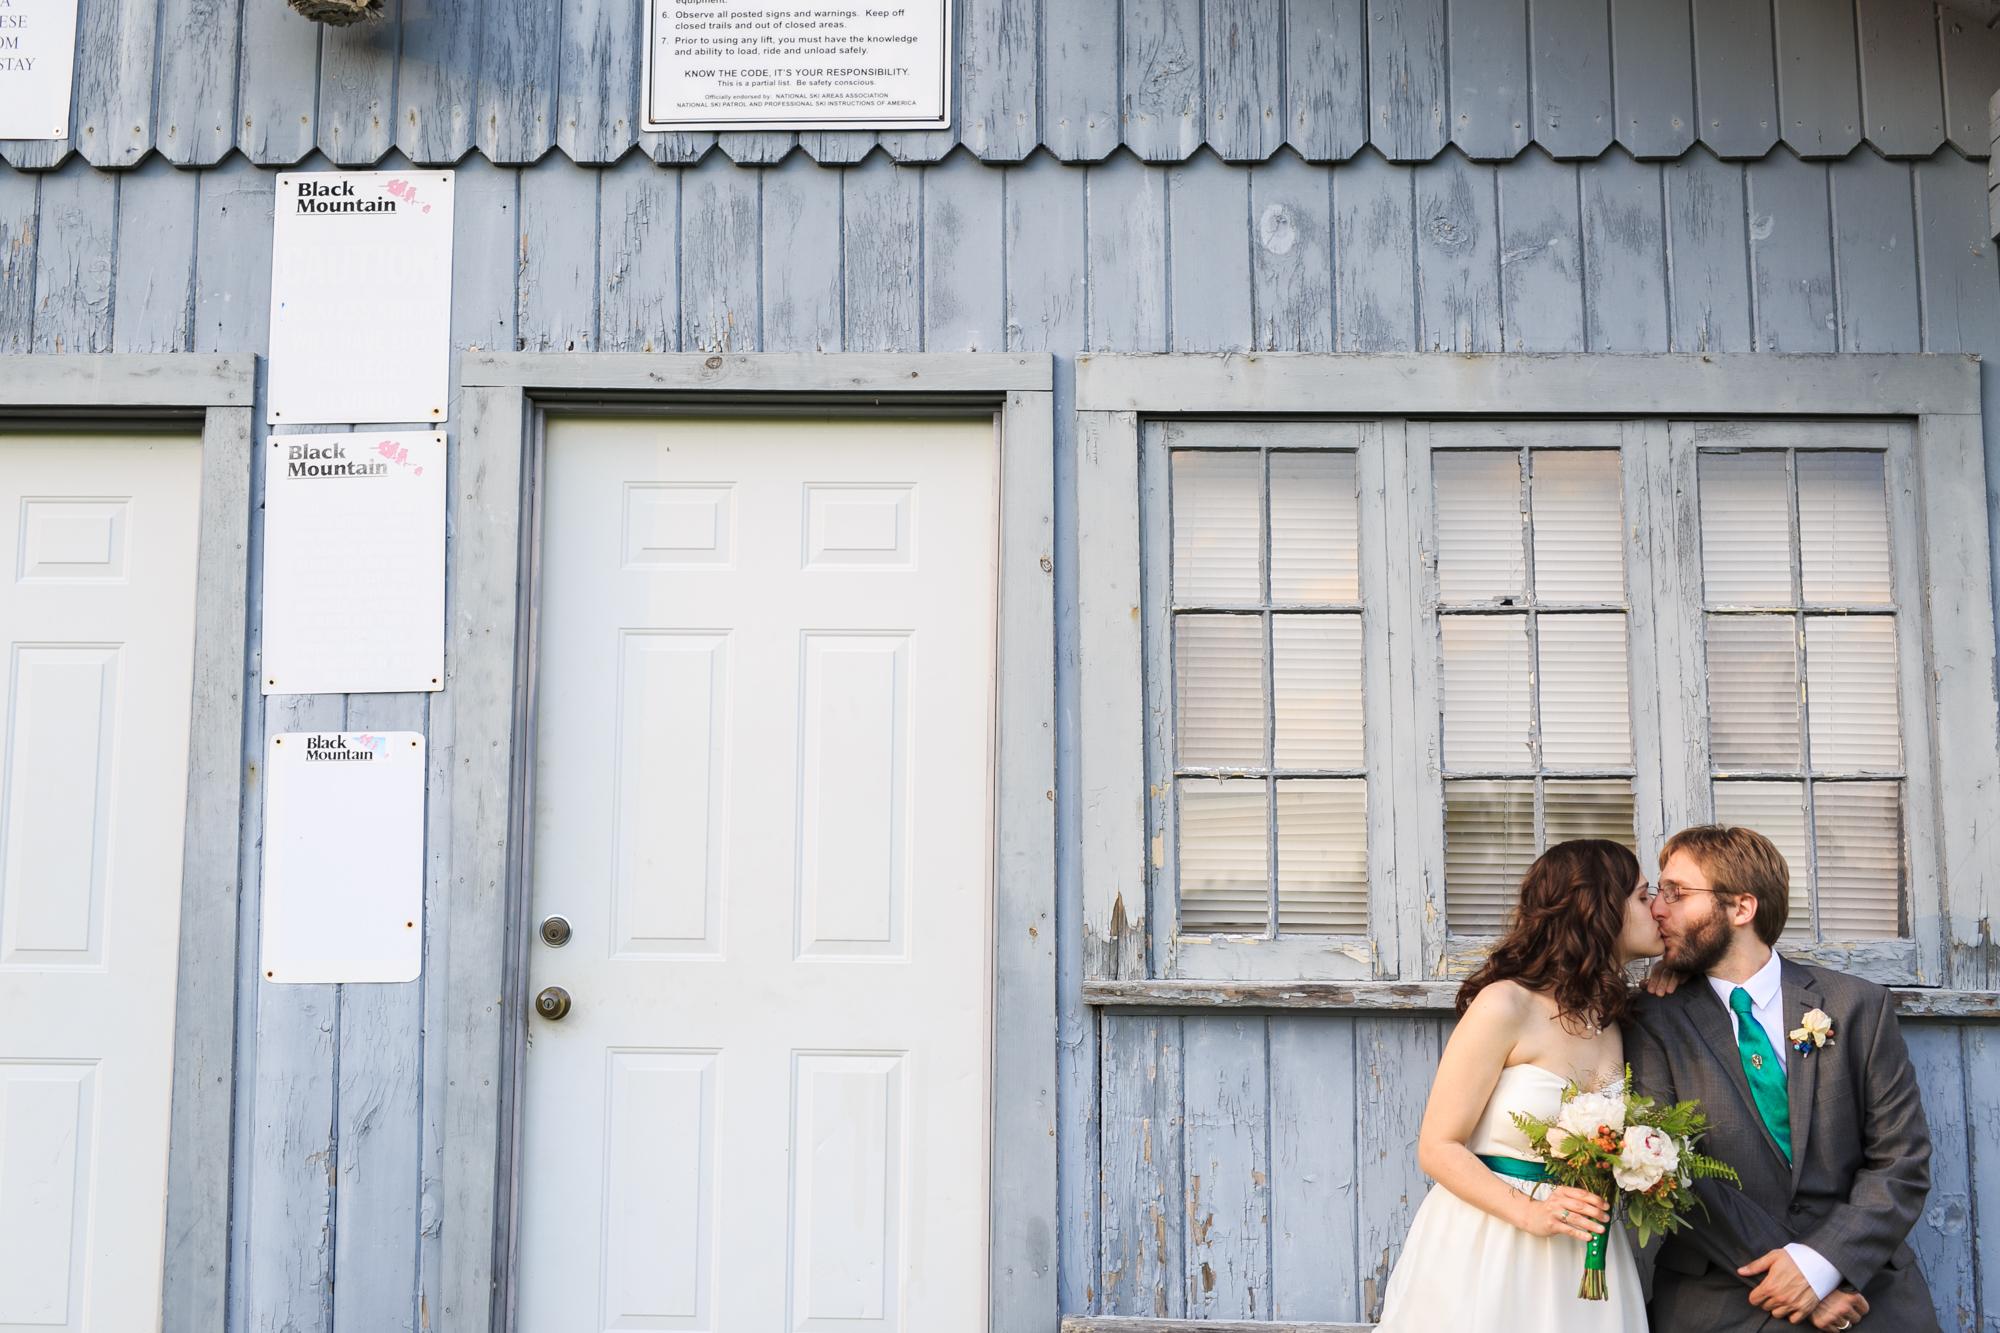 The-Shovel-Handle-Inn-Barn-Wedding-New-Hampshire-New-England-Wedding-Photography-17.jpg